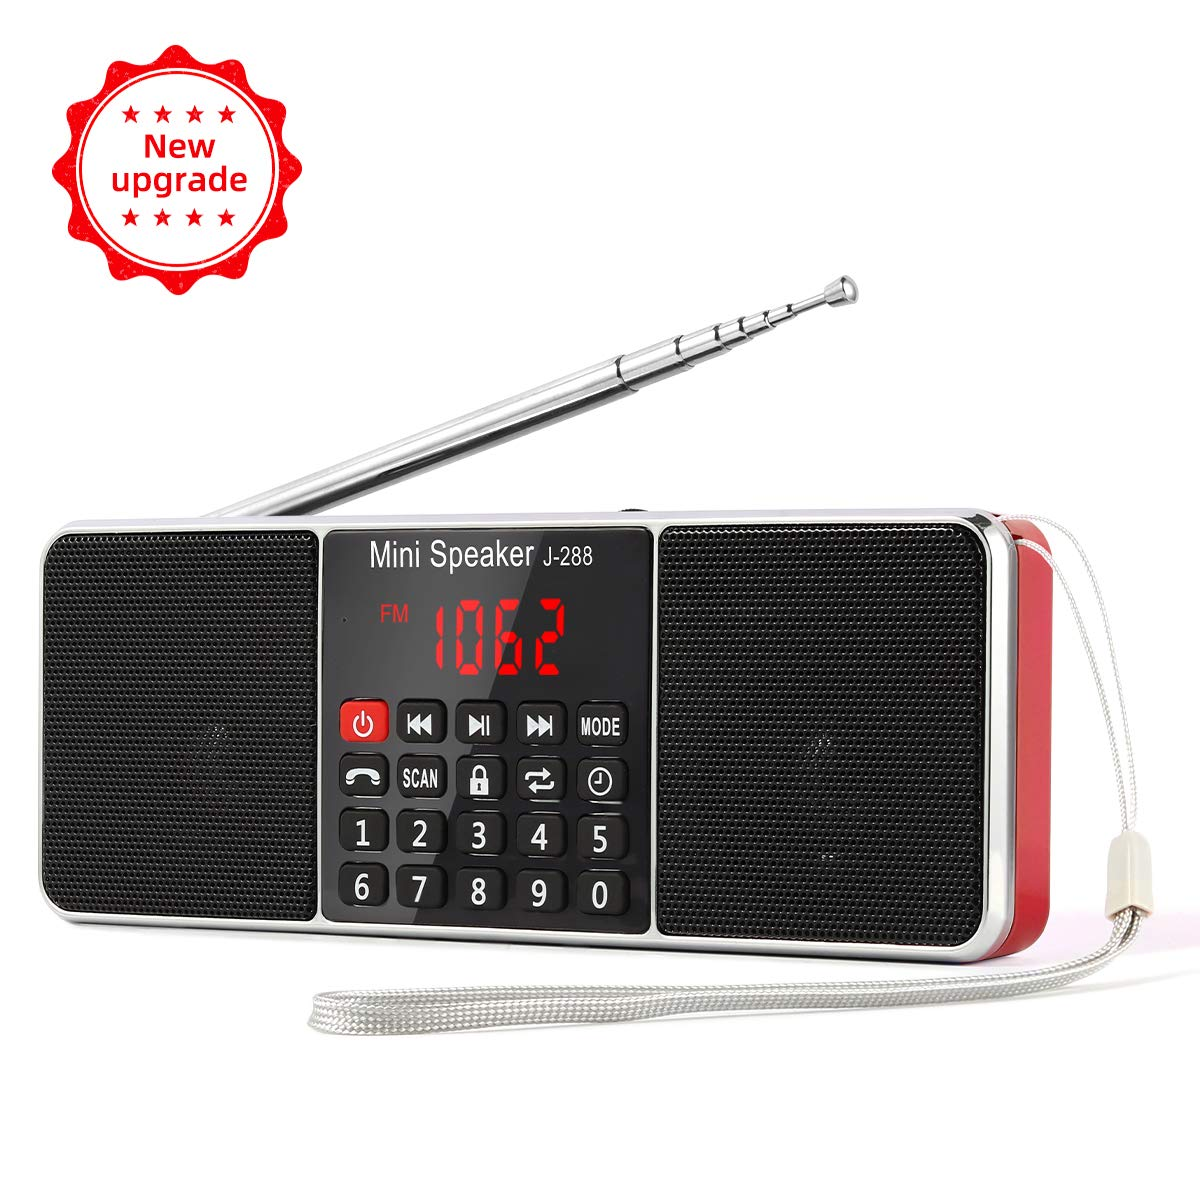 L-288 Radio portátil FM Am con Altavoz estéreo Bluetooth ...